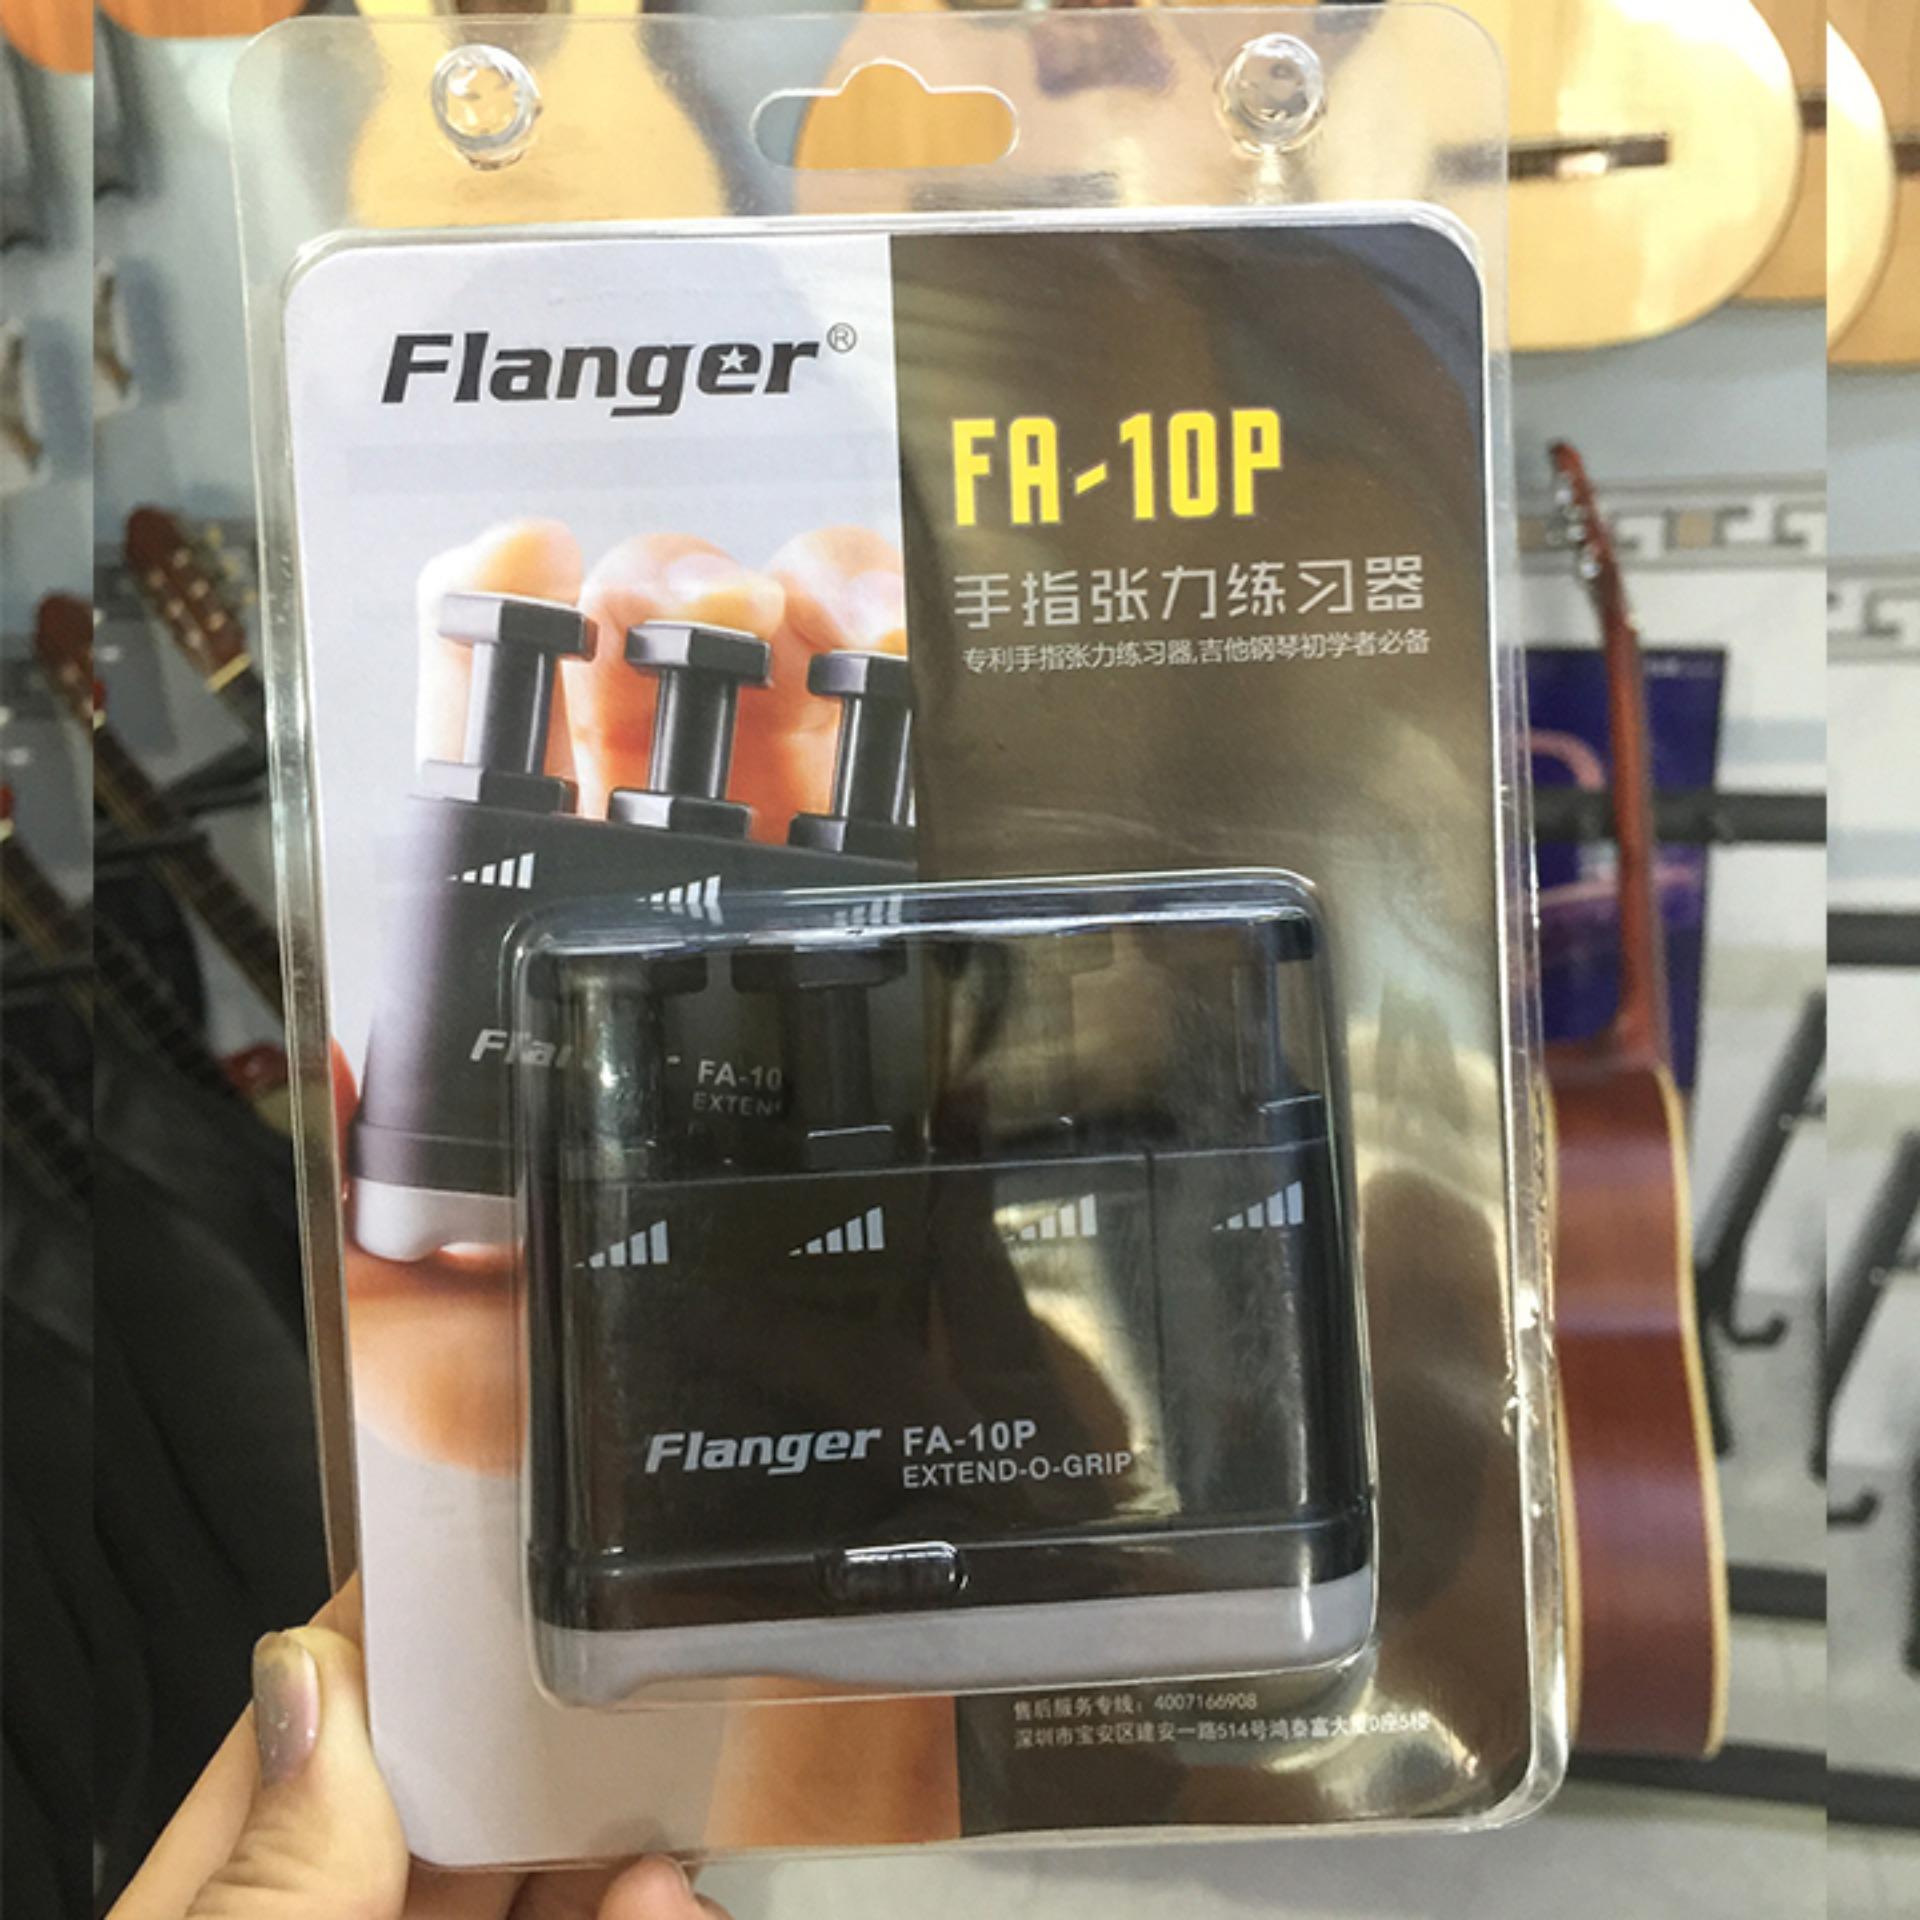 DỤNG CỤ LUYỆN NGÓN FLANGER FA-10P - MÁY TẬP NGÓN GUITAR / PIANO / ORGAN